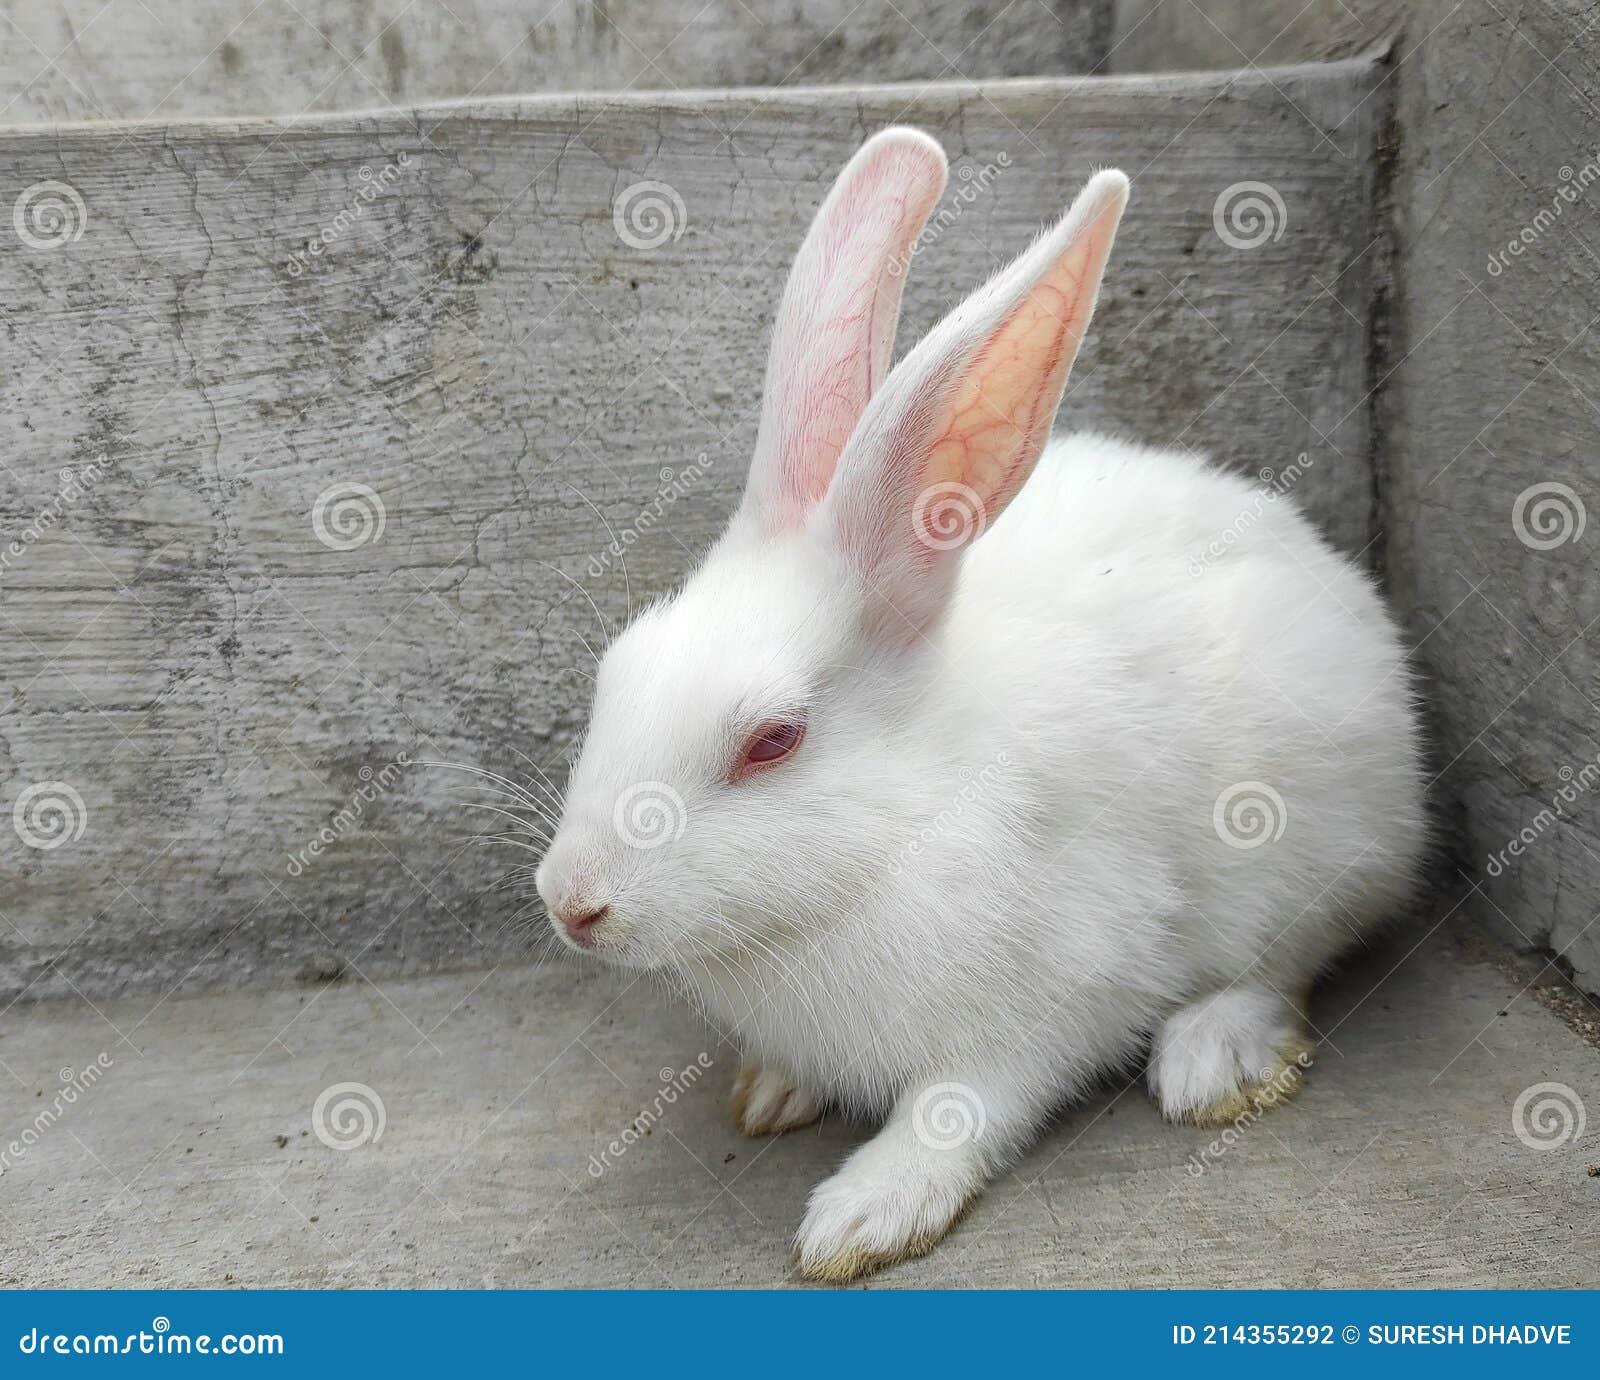 20,20 White Rabbit Red Eyes Photos   Free & Royalty Free Stock ...